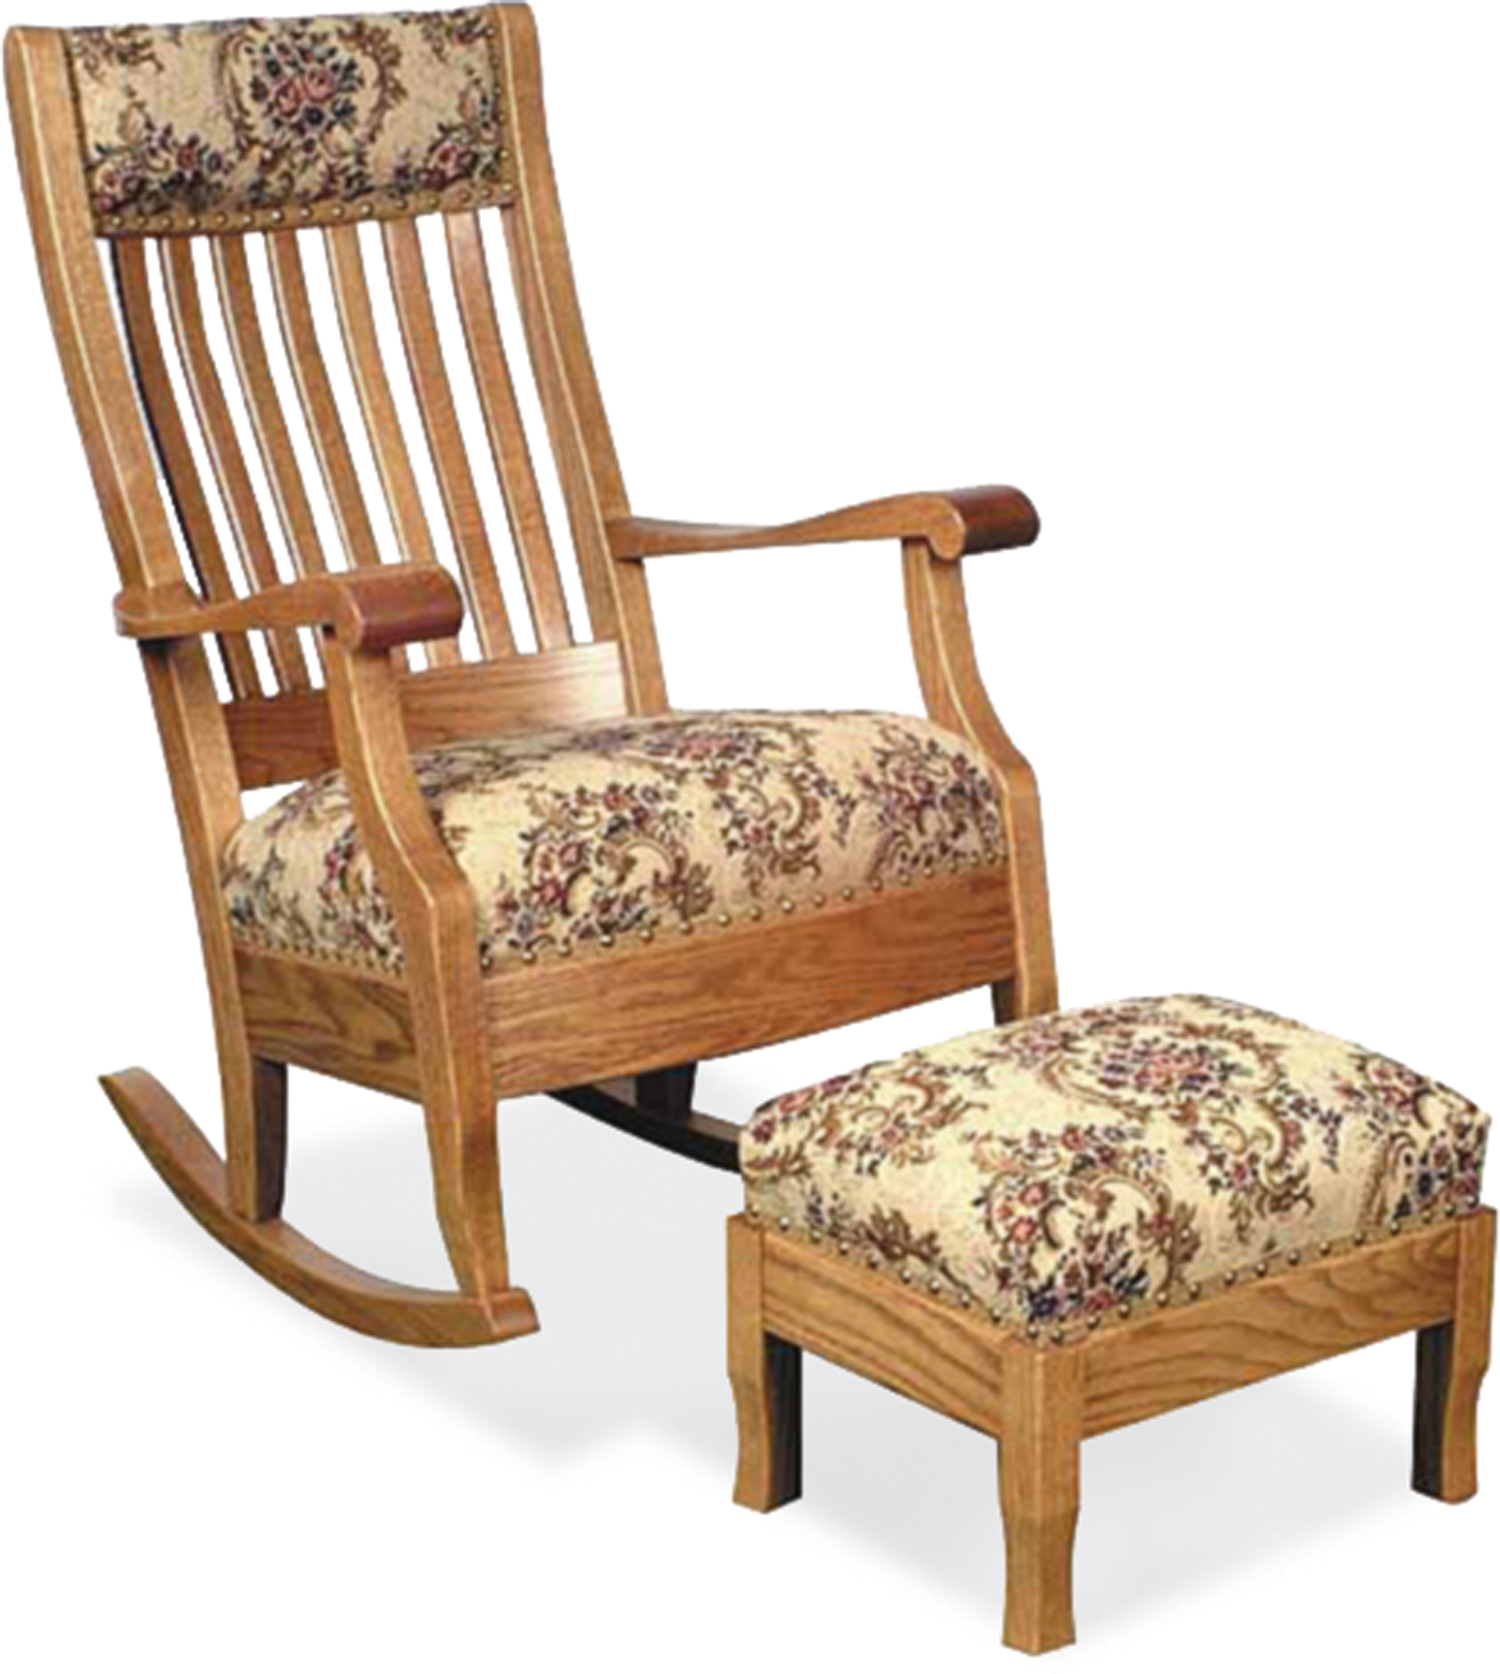 Grandma's Rocker with footstool